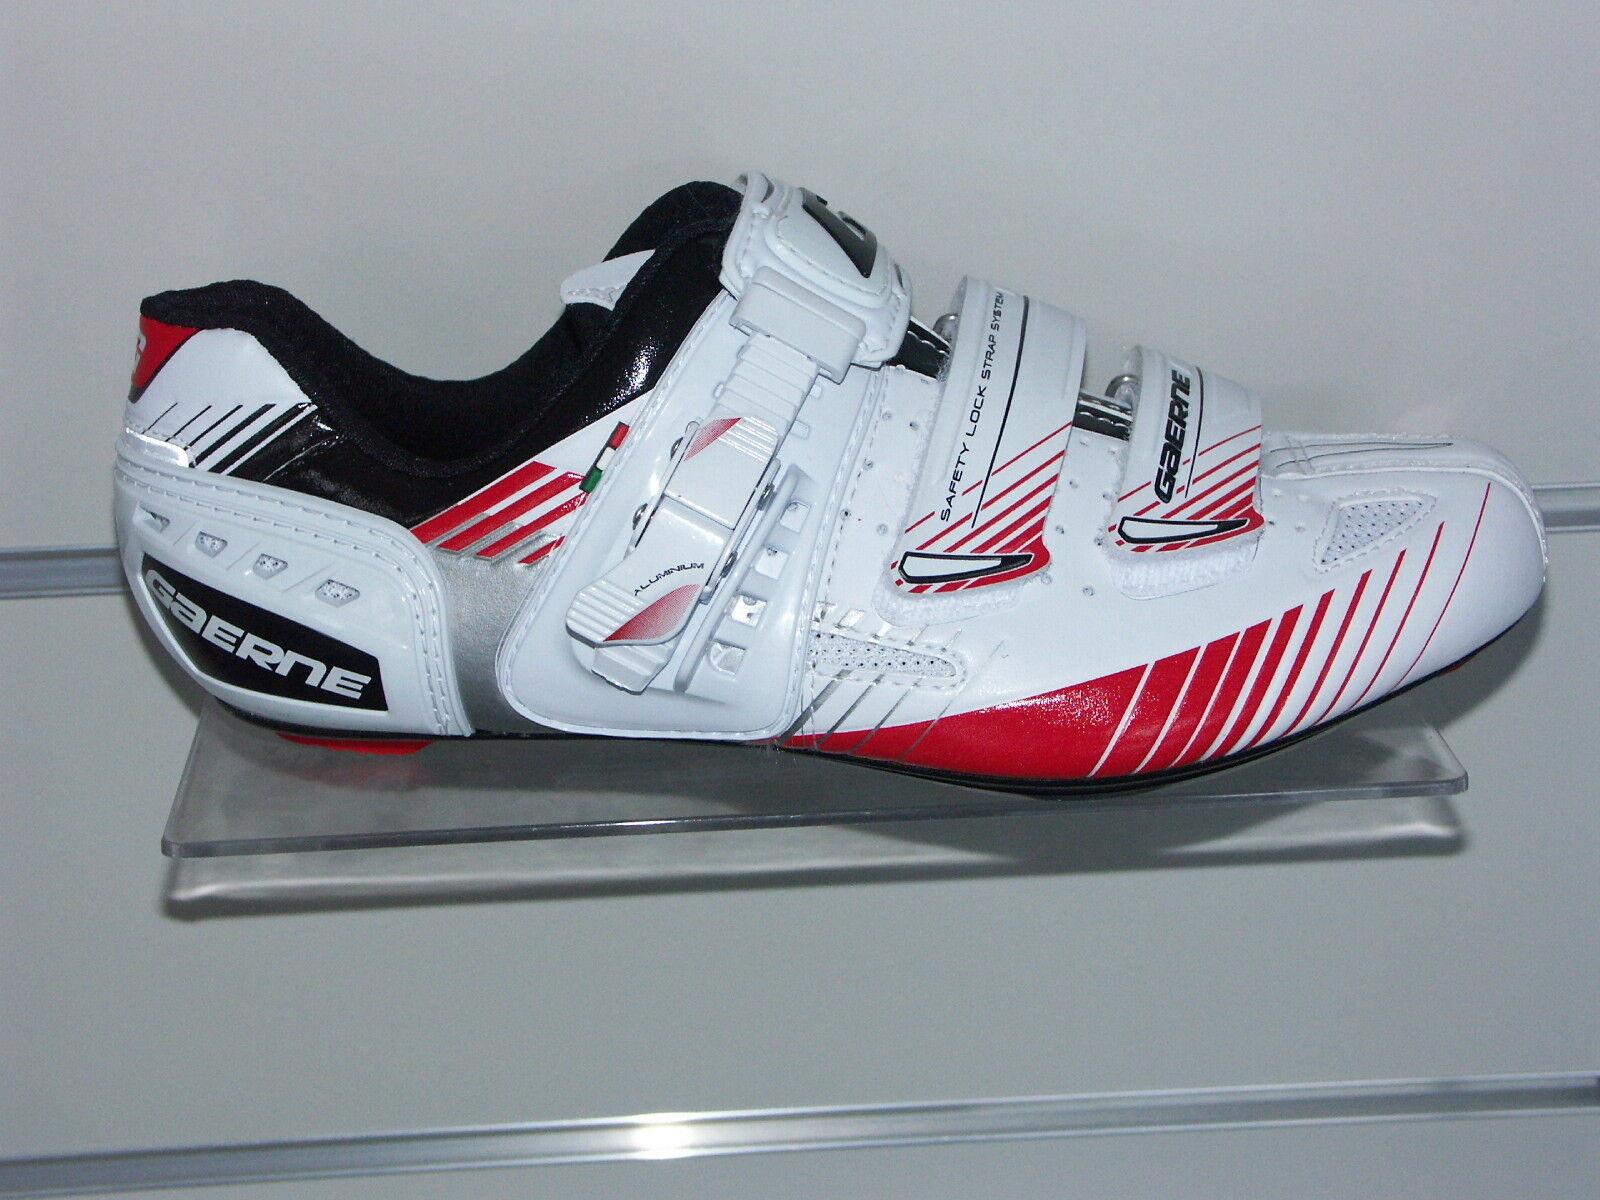 shoes DE CYCLISME ROUTE GAERNE G-MOTION RED POINTURE 42 NEUVES